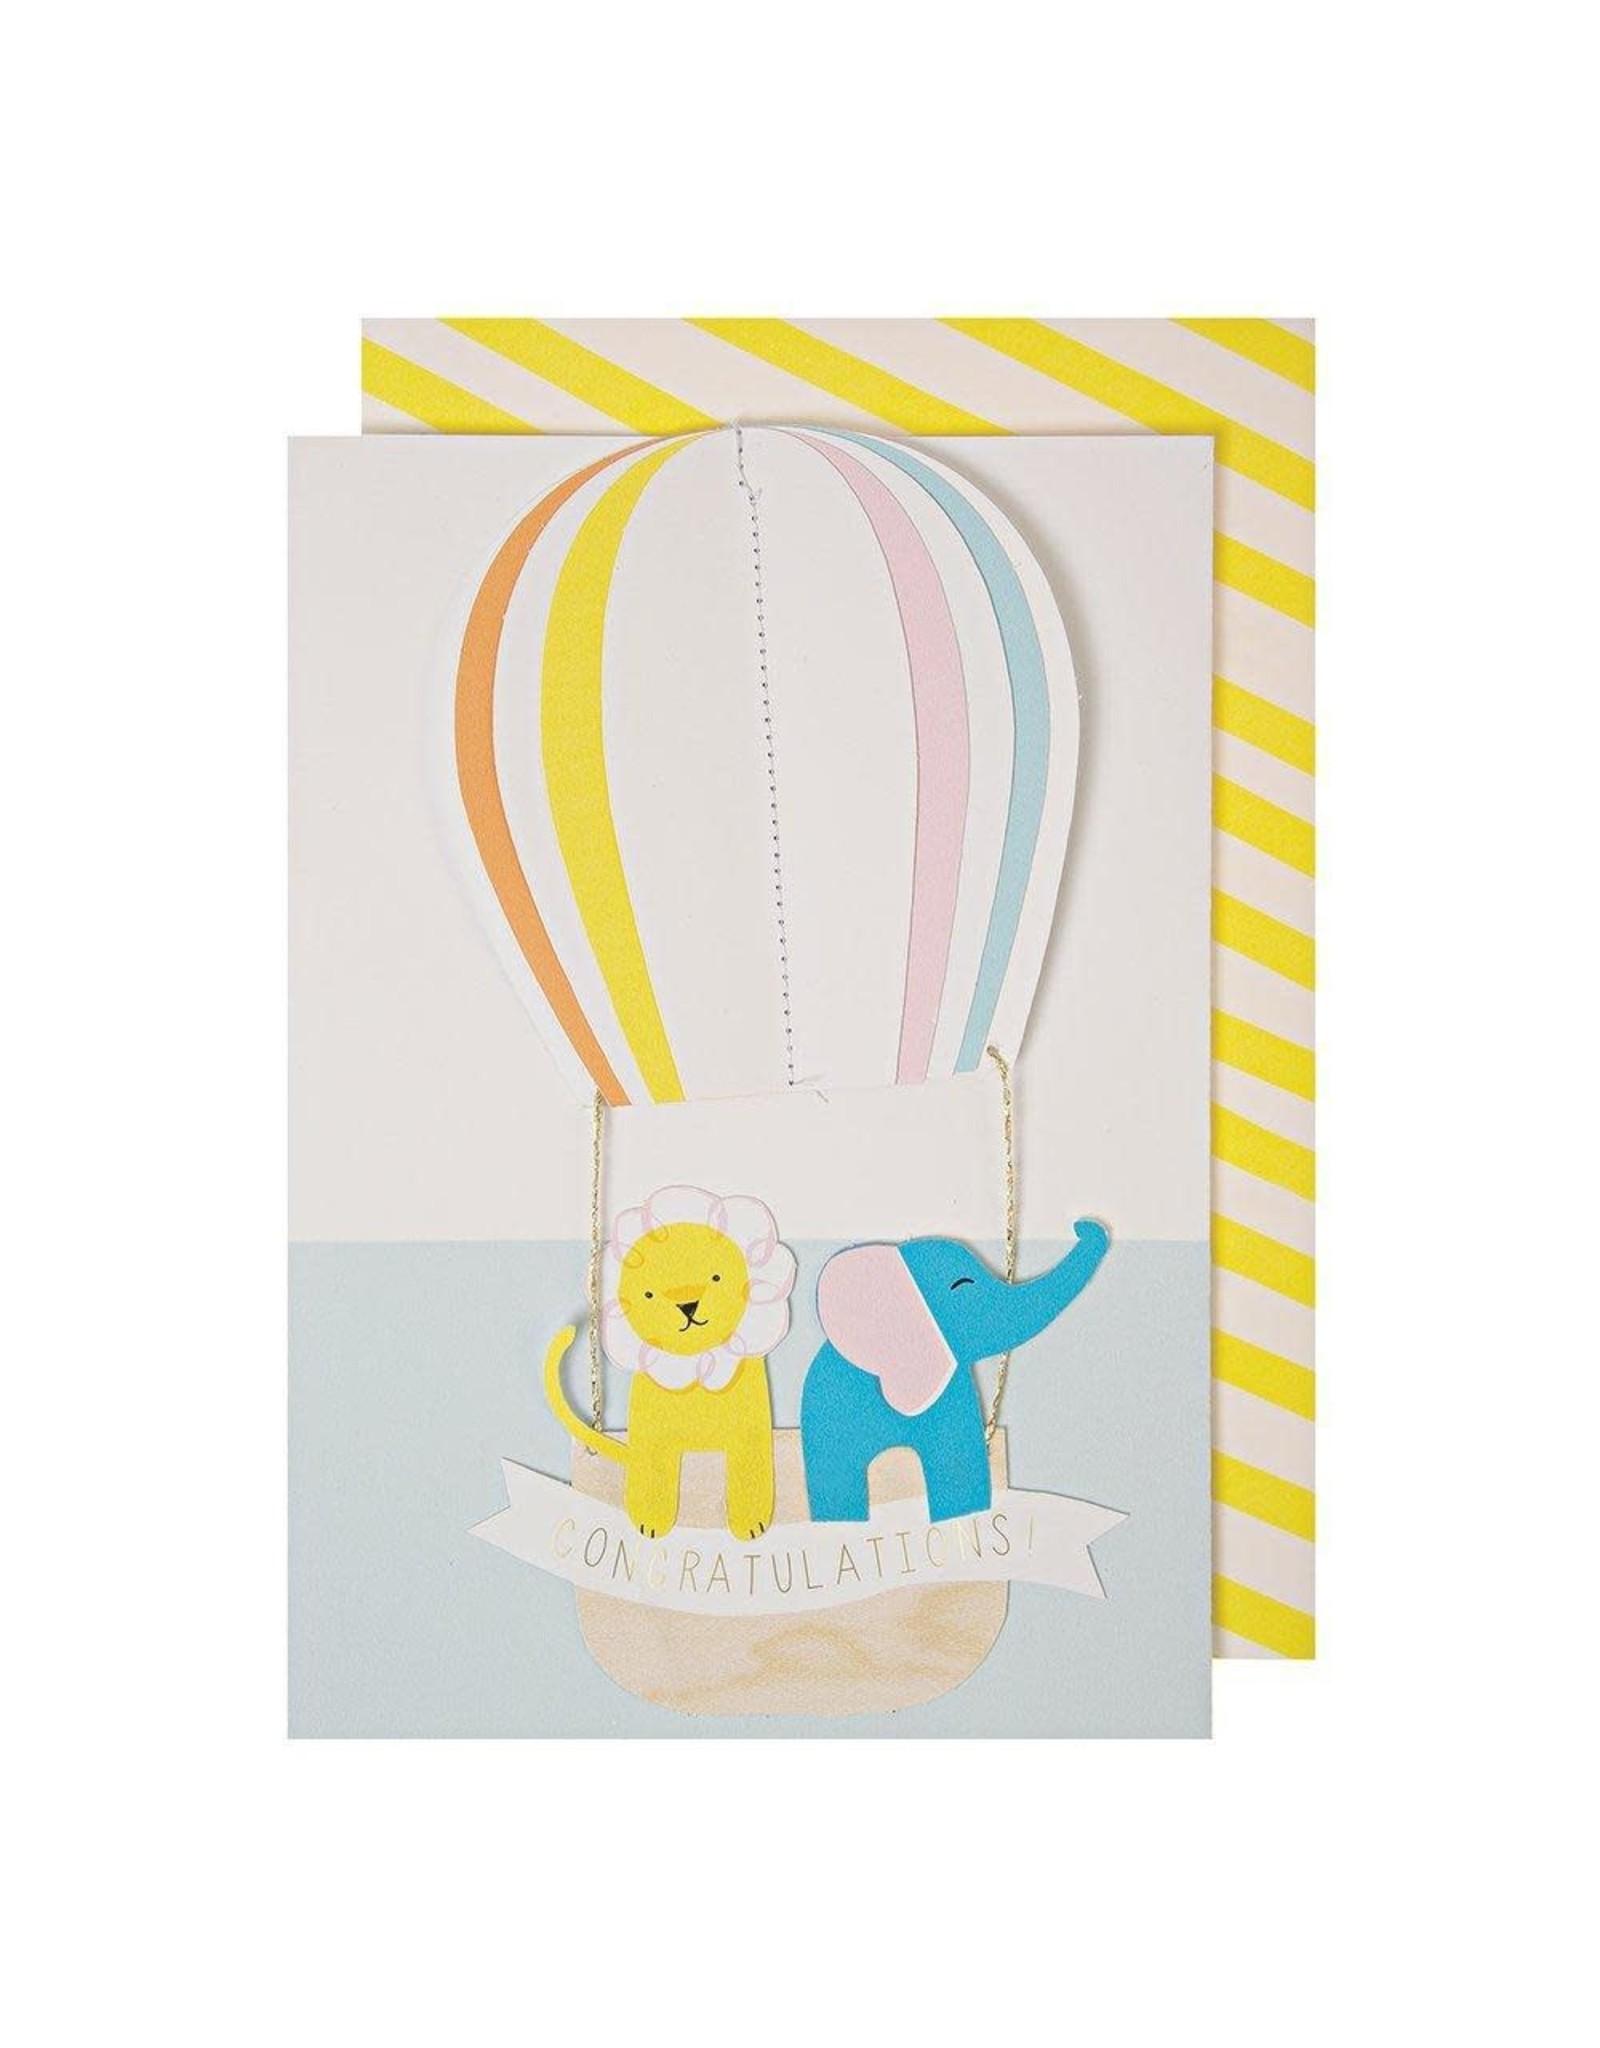 Meri Meri Wenskaart - Hot Air Balloon card + Envelope  - 10,5 x 23,5 - Congratulations